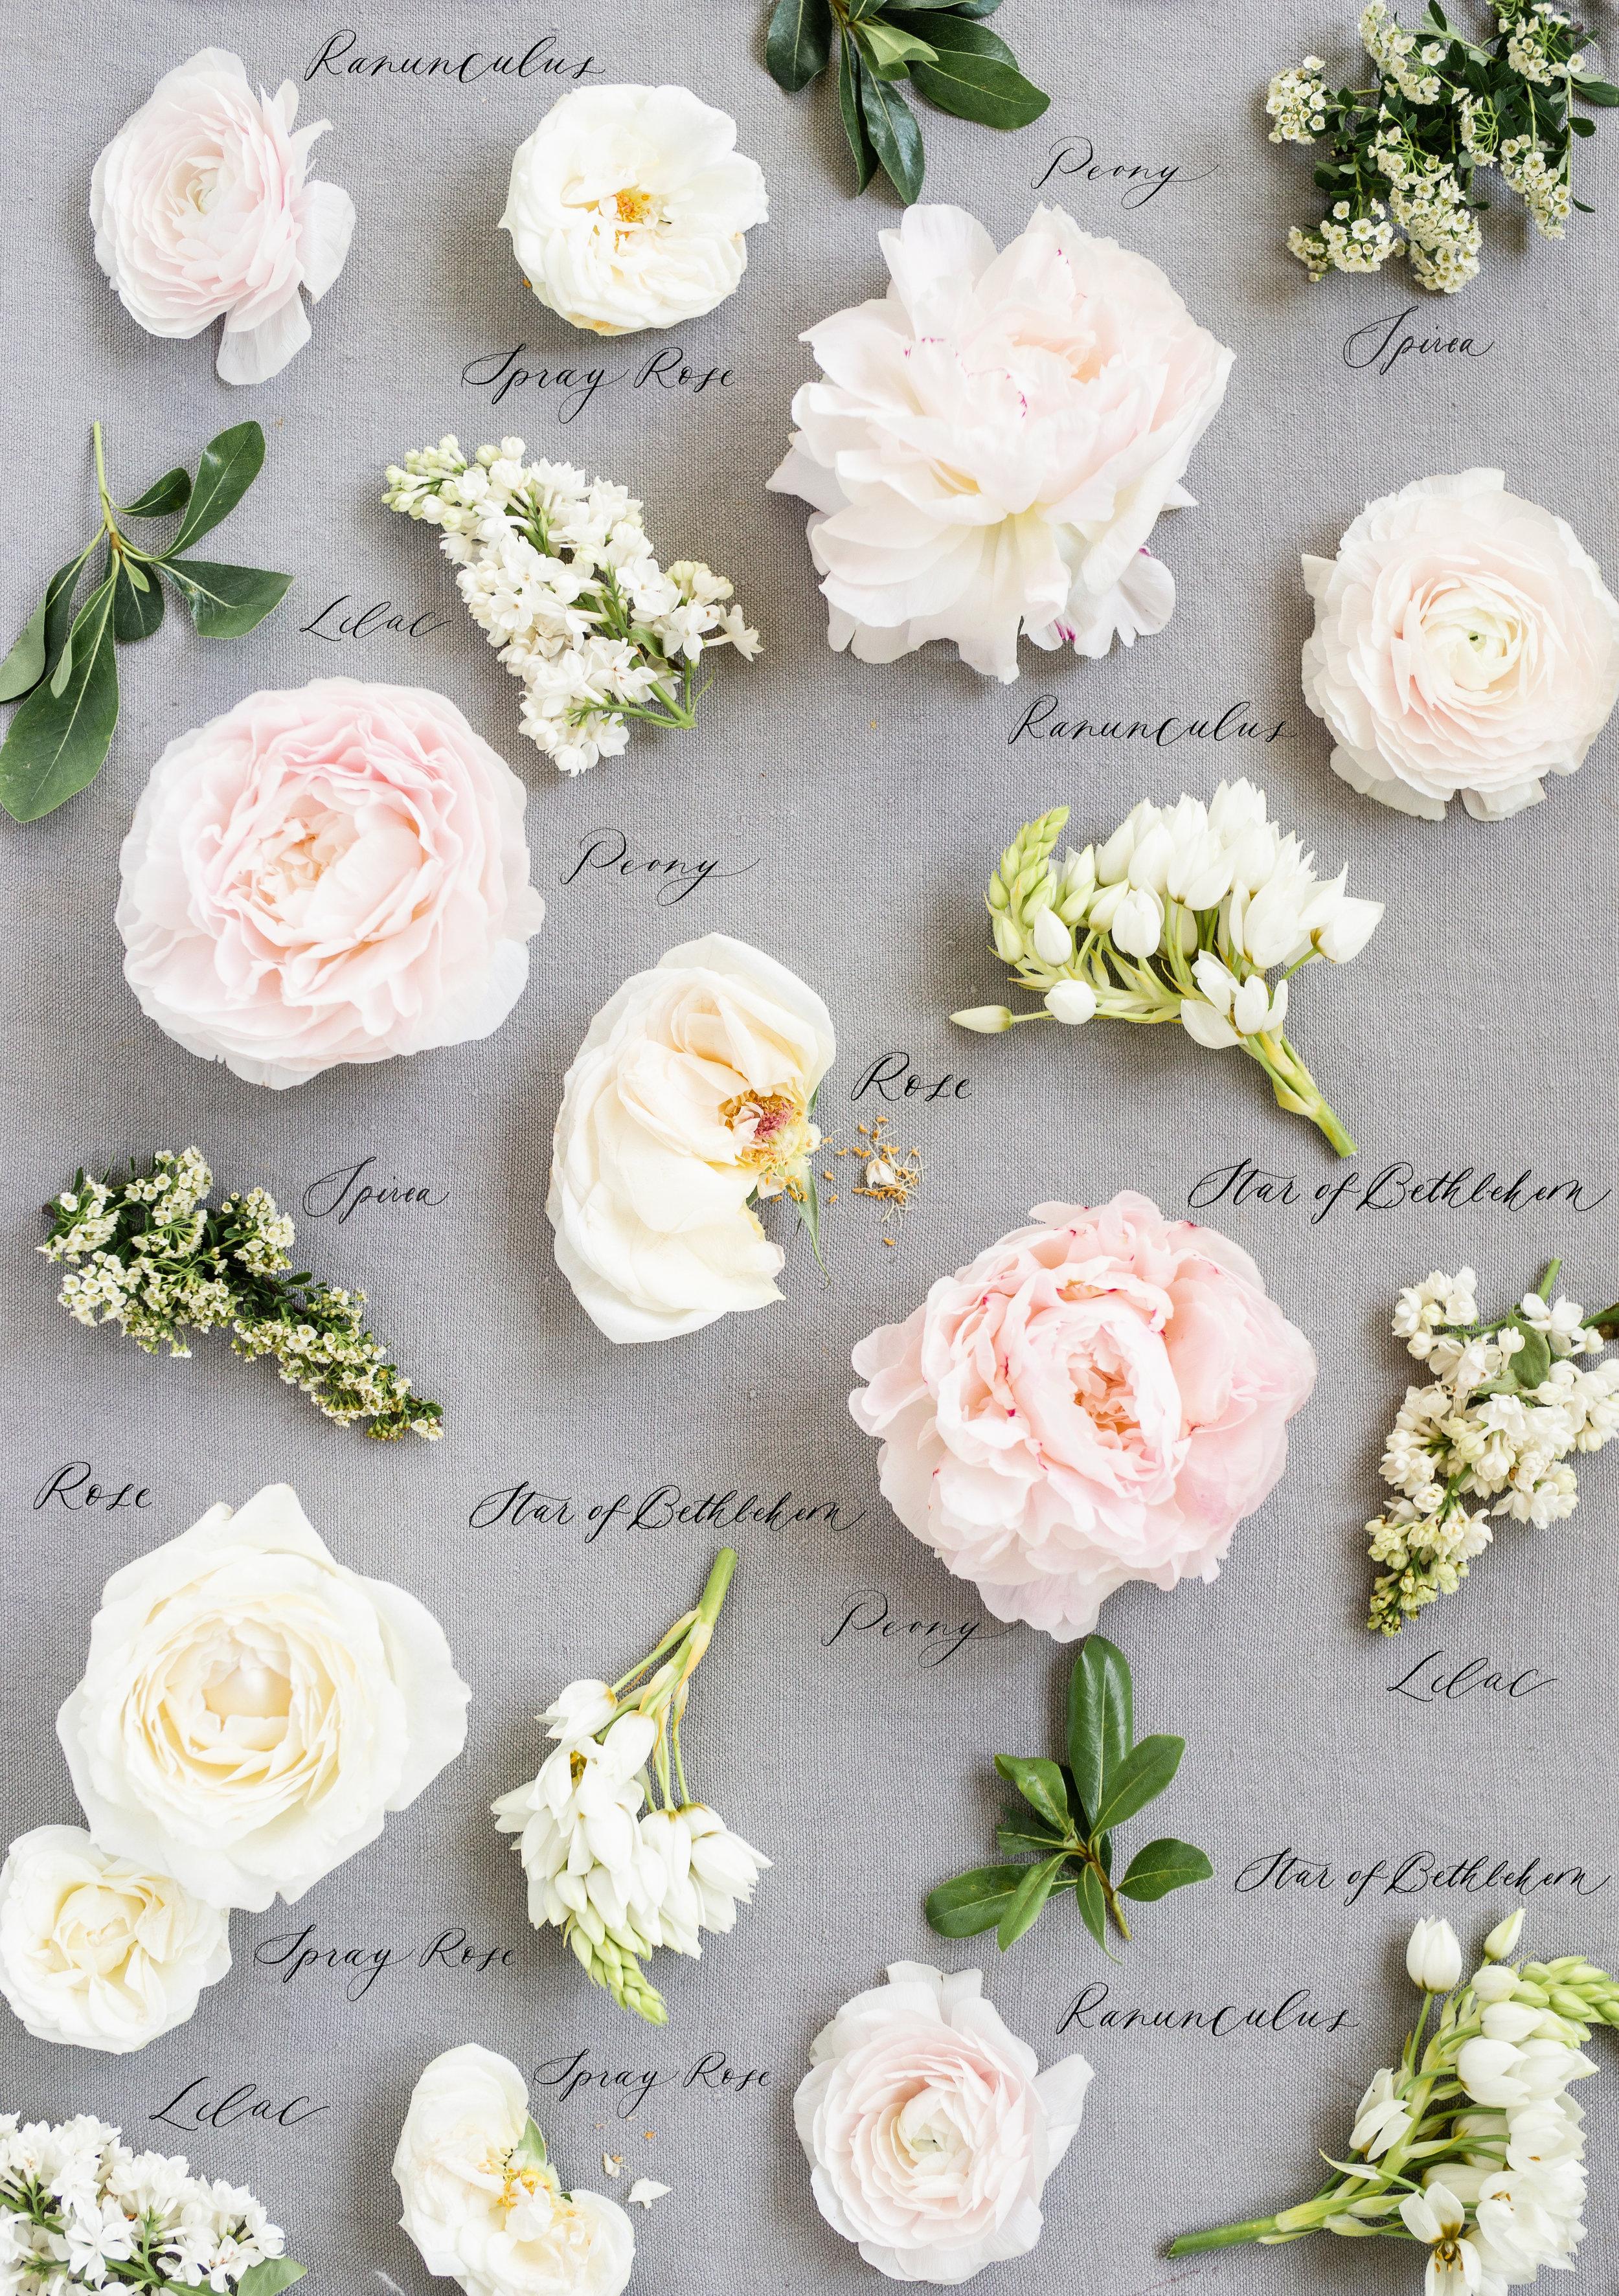 Image Courtesy of Jaimee Morse of Heirloom Bouquet